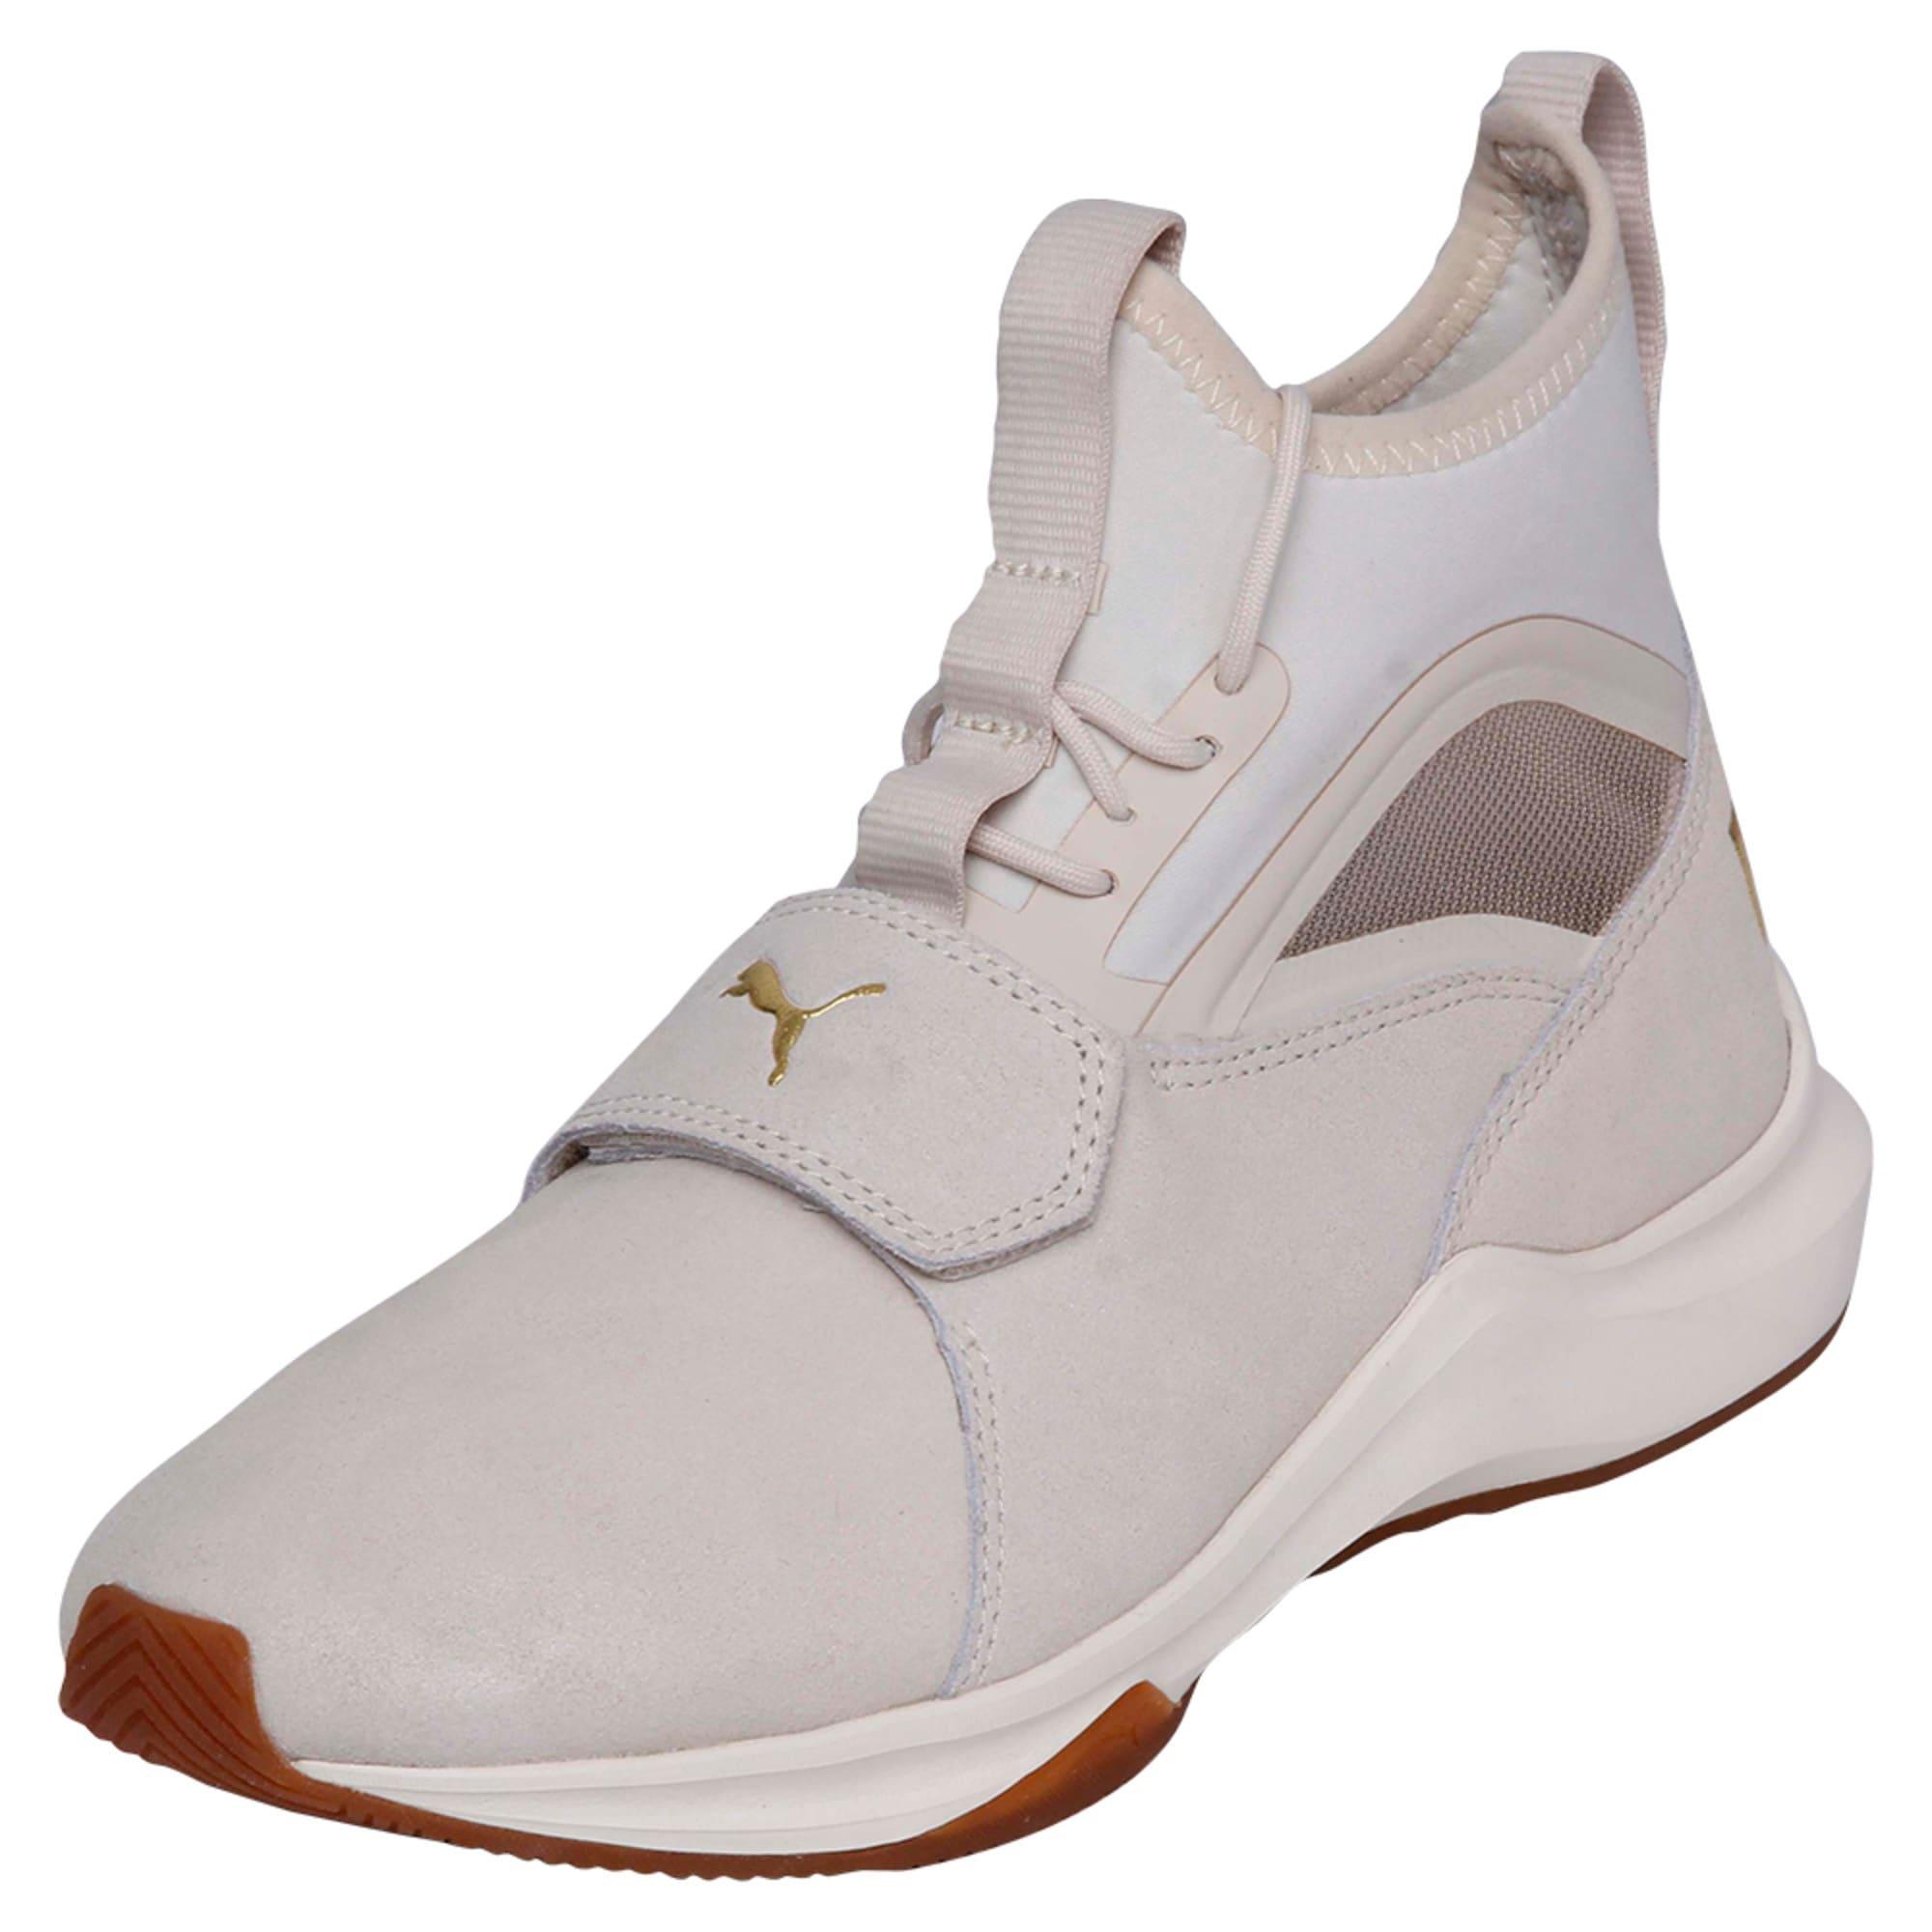 Thumbnail 1 of Phenom Shimmer Women's Training Shoes, Birch-Whisper White, medium-IND